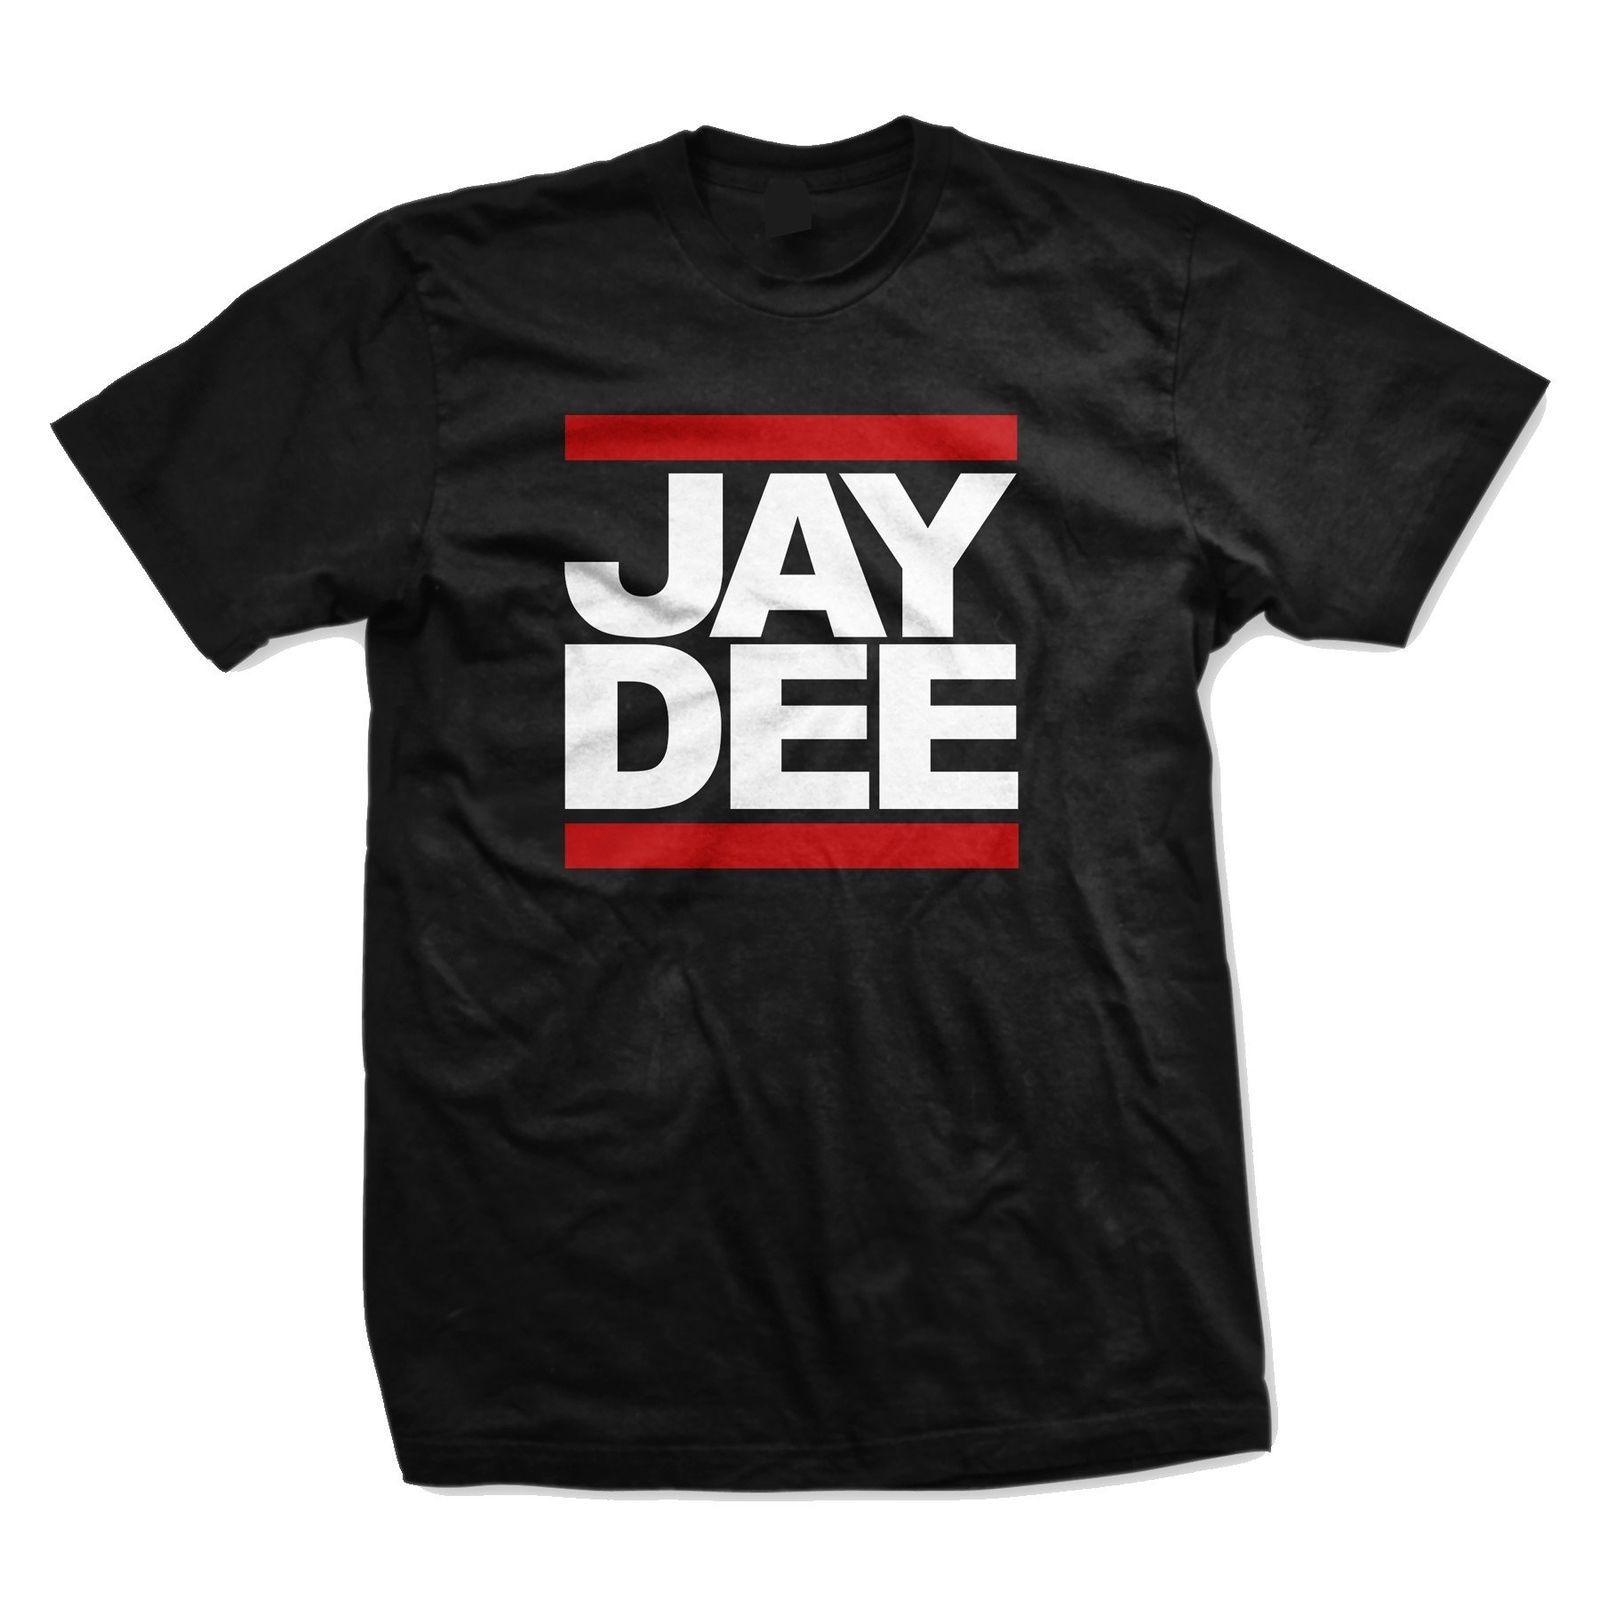 Футболка Jay Dee AKA J Dilla, брендовая футболка для мужчин, модная футболка с коротким рукавом, 100% t, футболка в стиле Харадзюку, Забавные топы